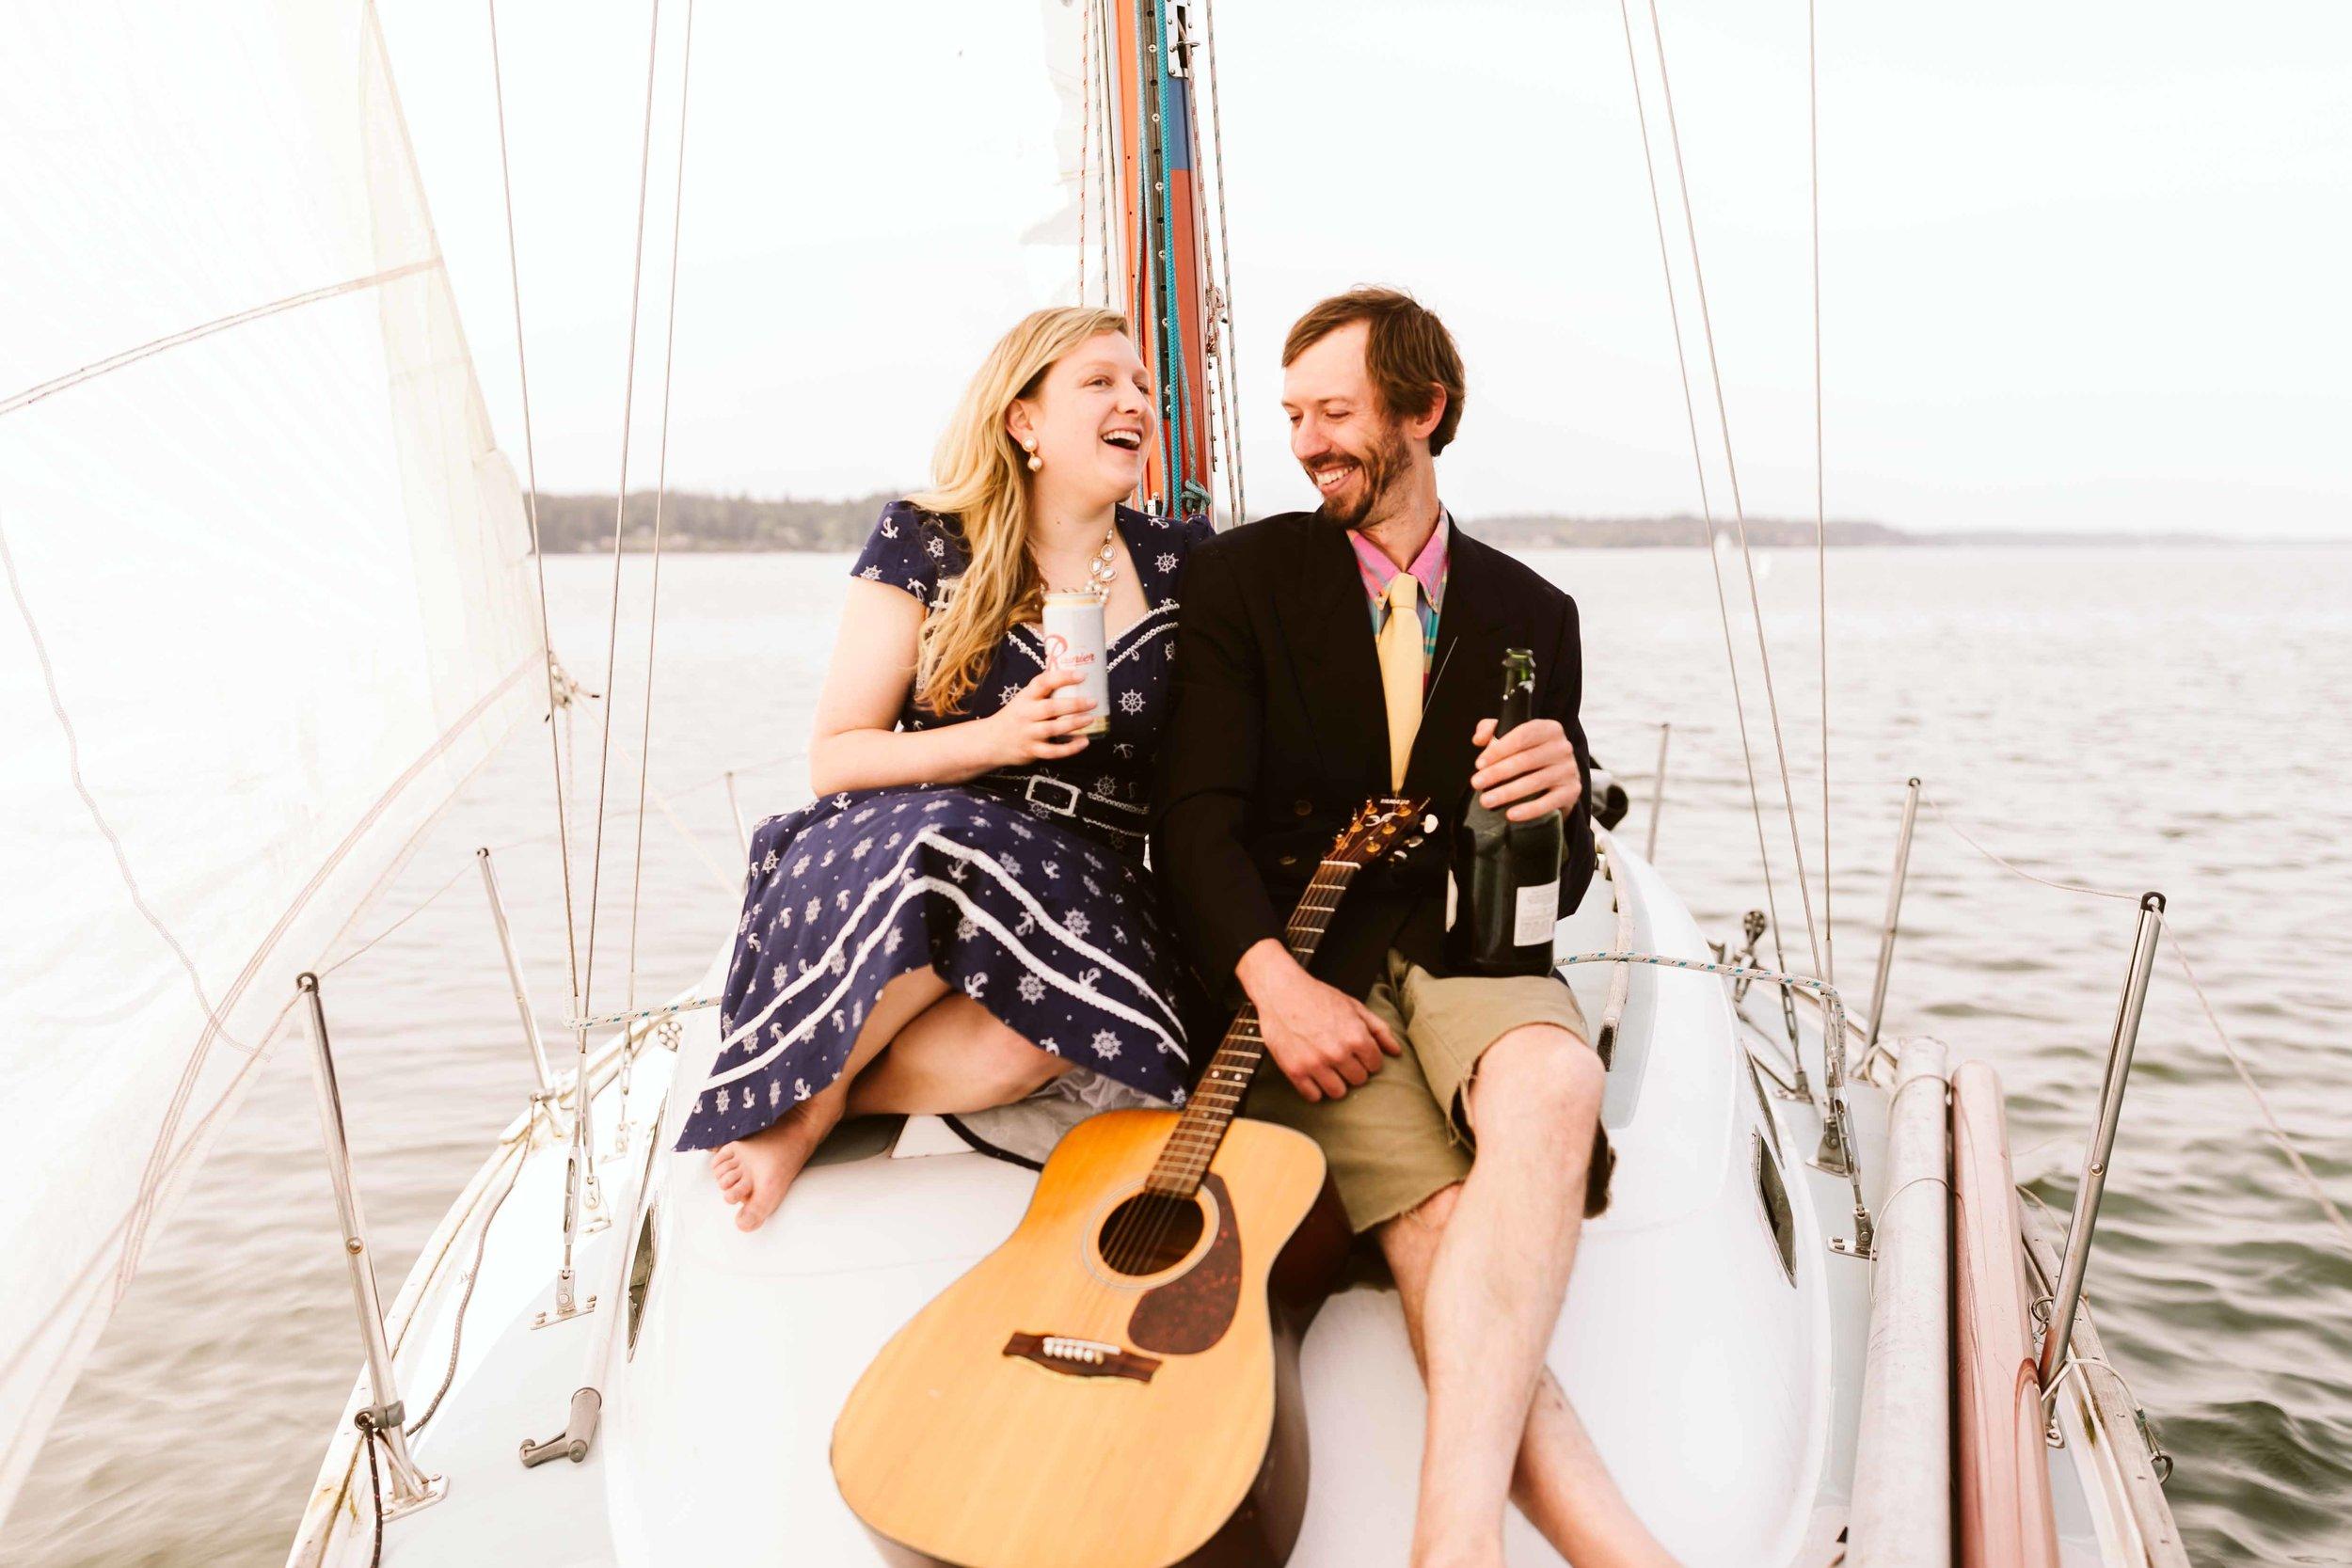 sailboat-engagement-photos-18.jpg